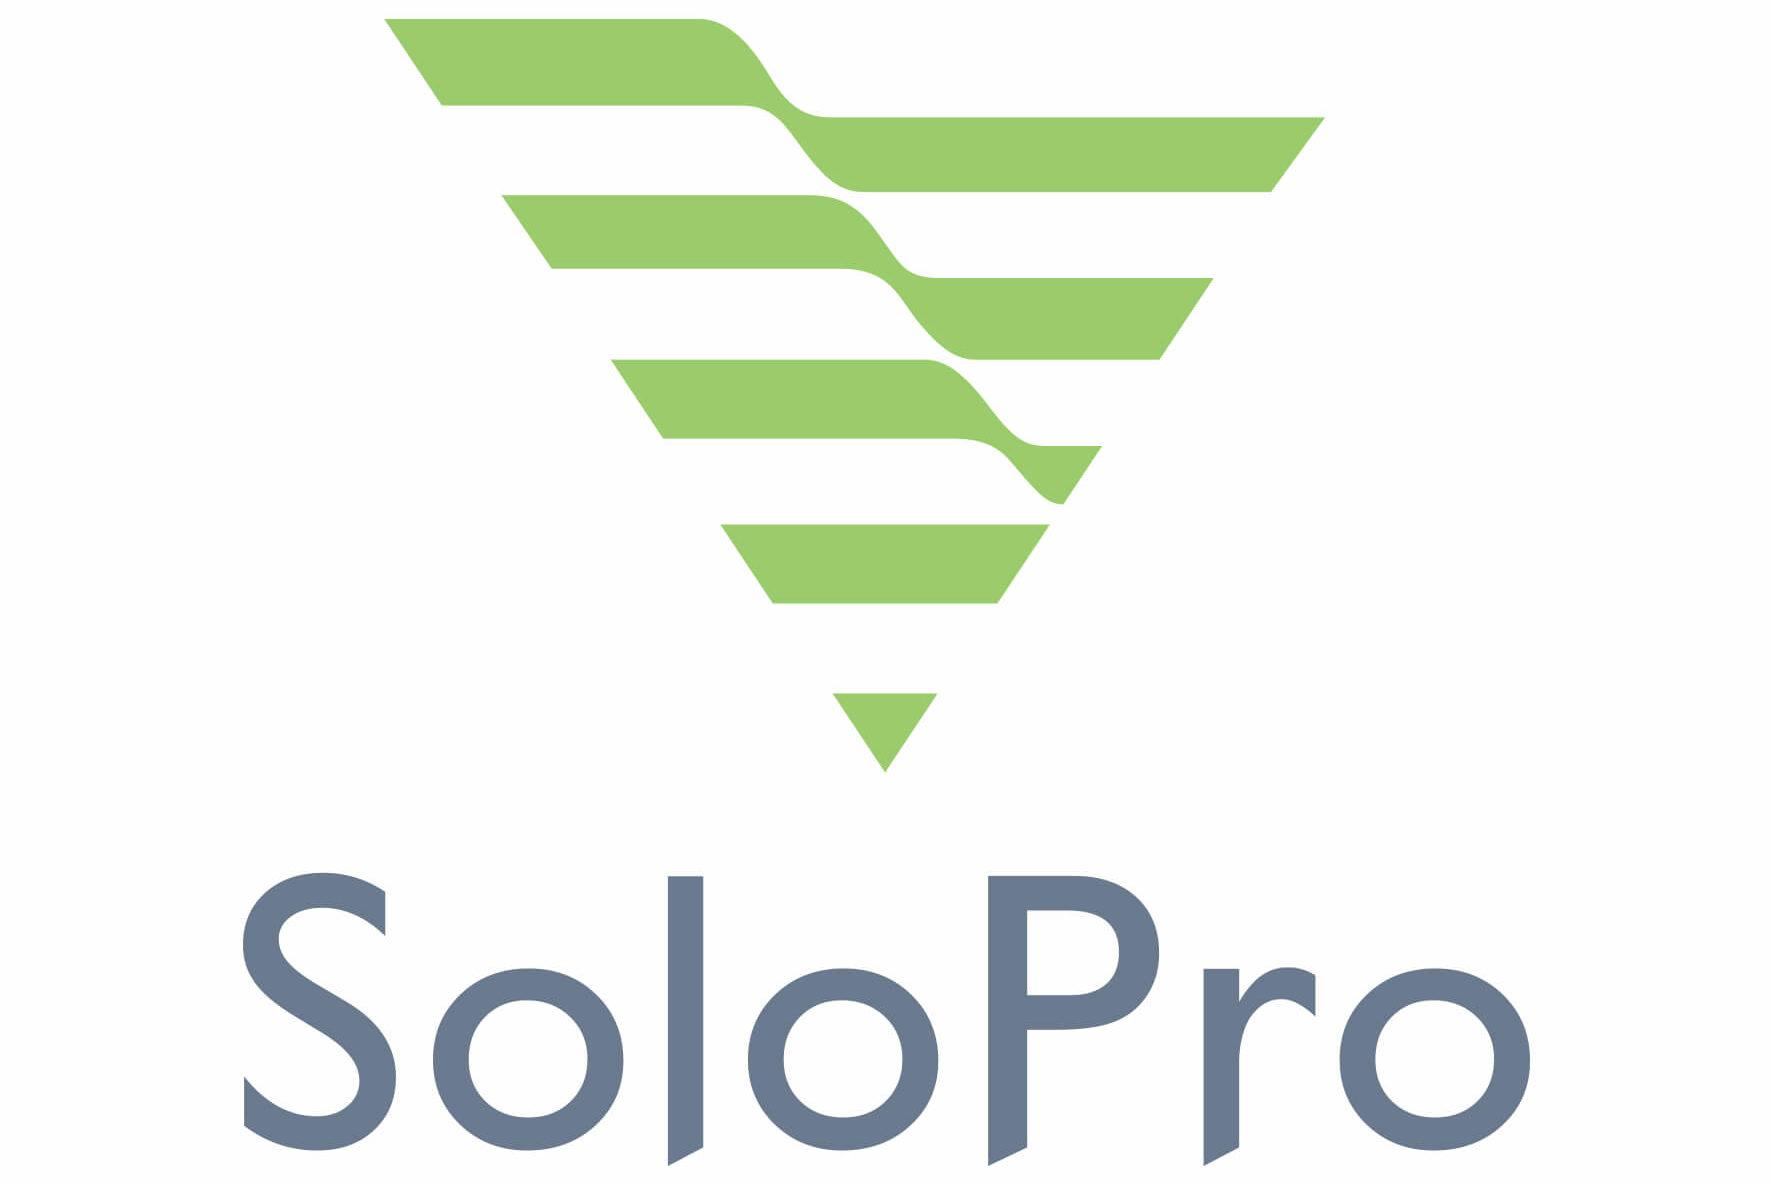 SoloPro (ソロプロ)自分の旗を立てる、働き方のサードプレイス